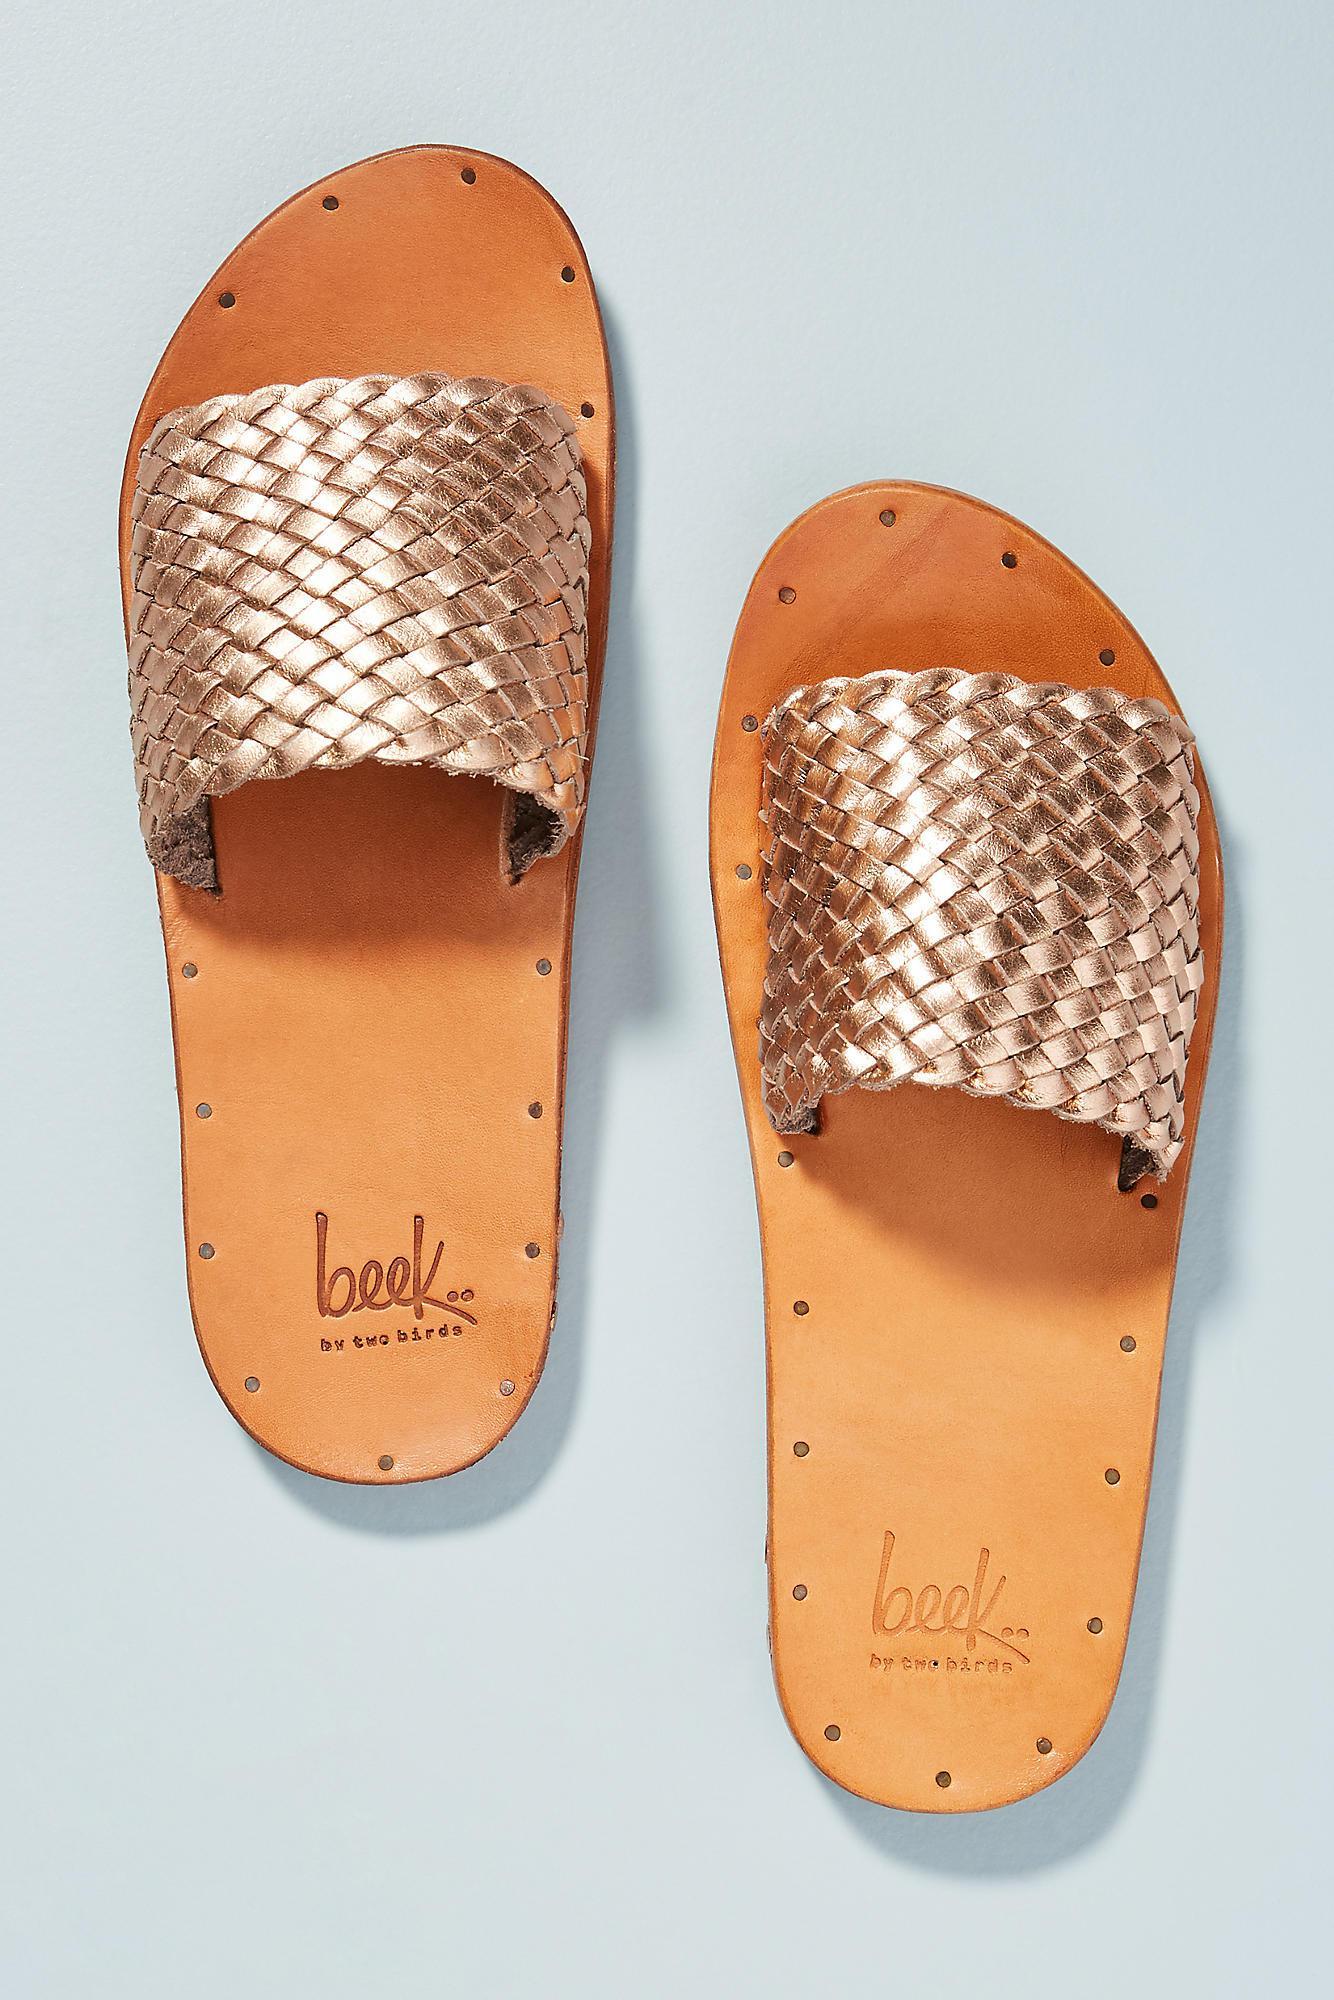 lowest price online 100% guaranteed Beek Ospery Slide Sandals rsXaGmgwrr